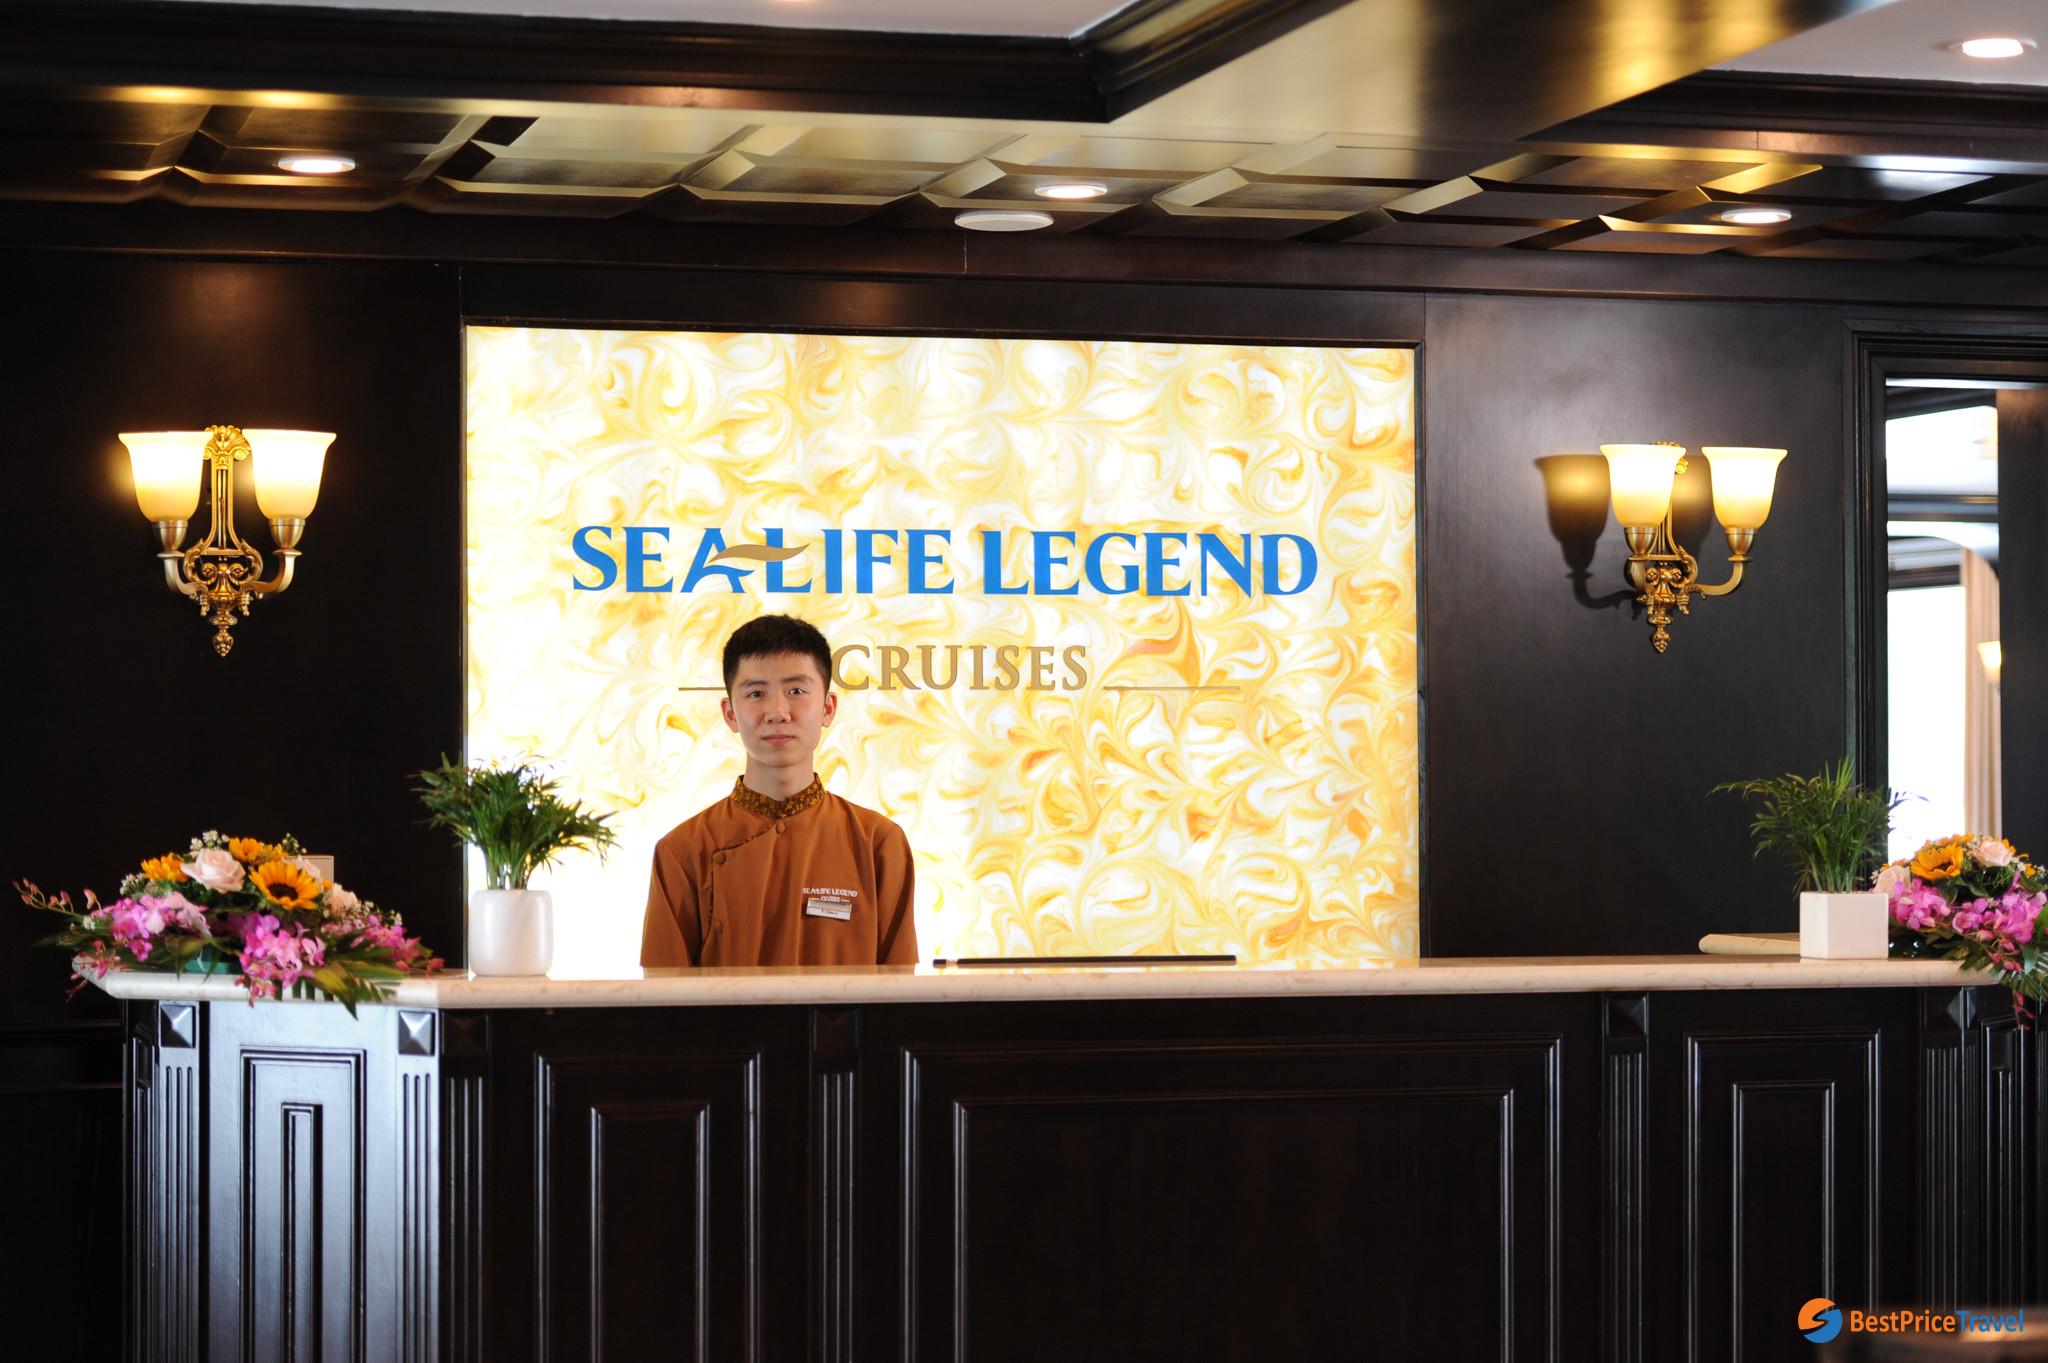 Reception of sealife legend cruise